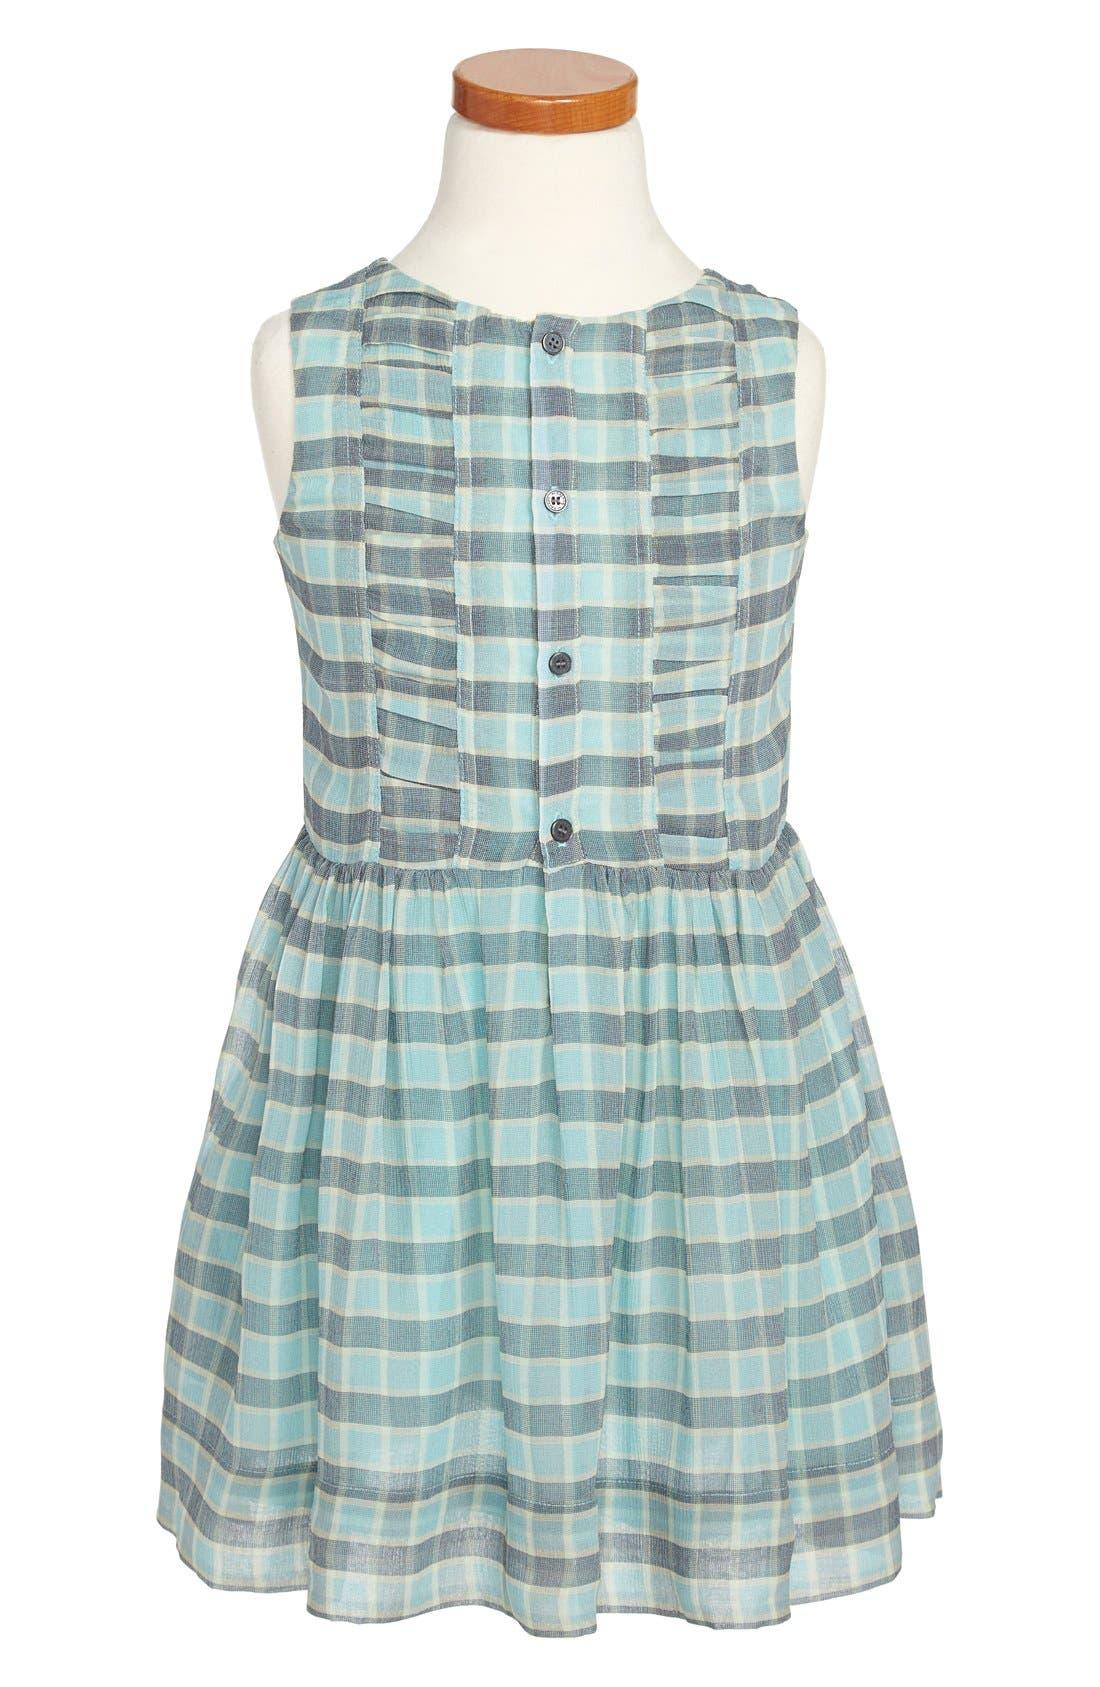 Main Image - Burberry Ruched Silk Dress (Little Girls & Big Girls)